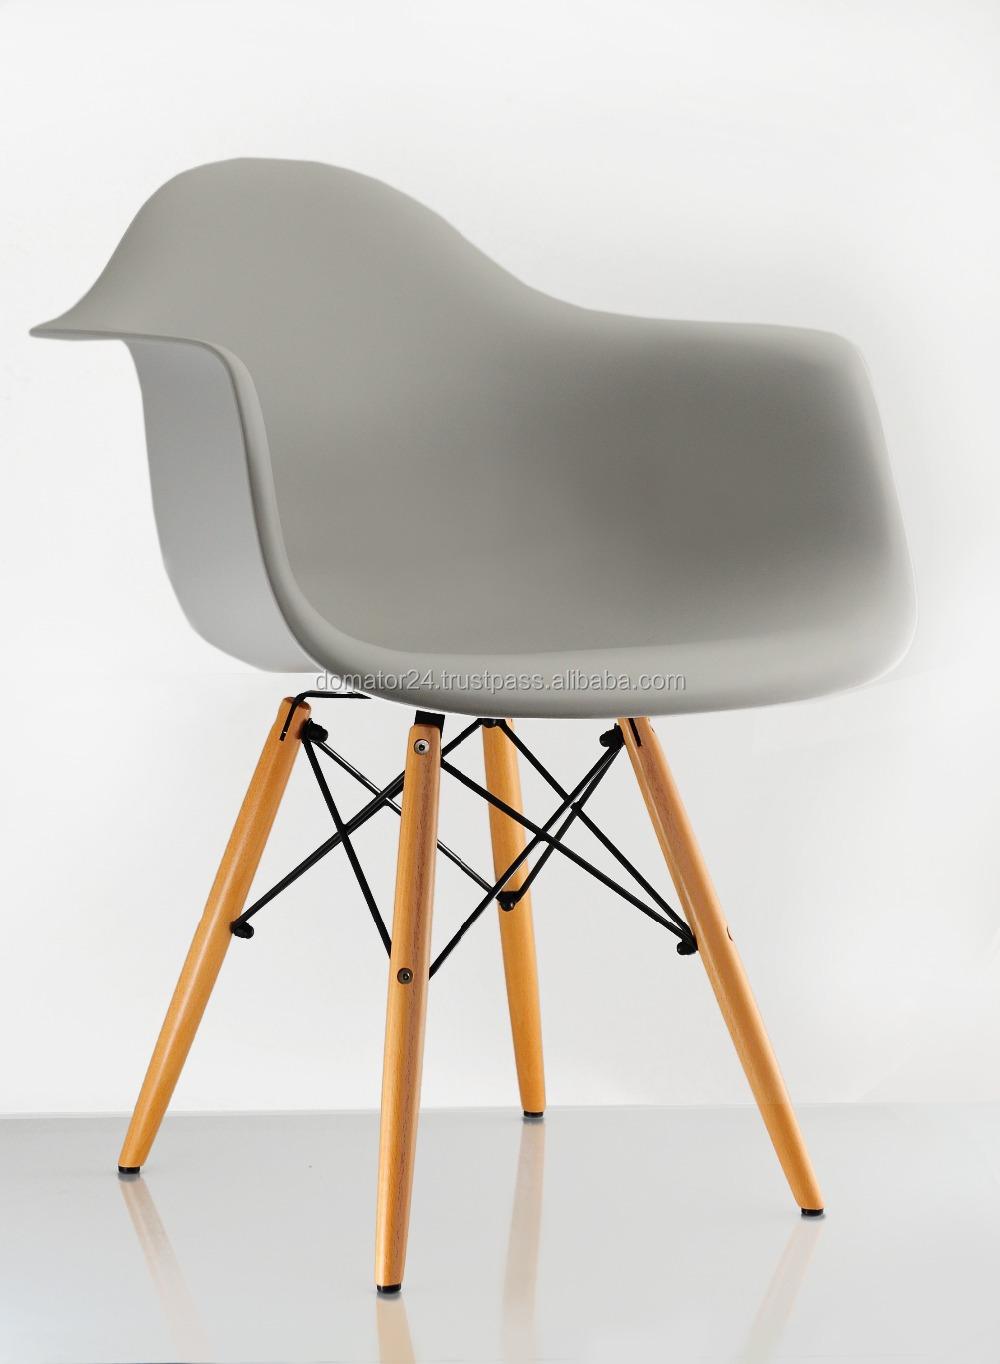 Beige modern armchair - Design Eiffel Inspired Modern Armchair Chair For Living Room Lounge Leisure Top Model 14 Colours